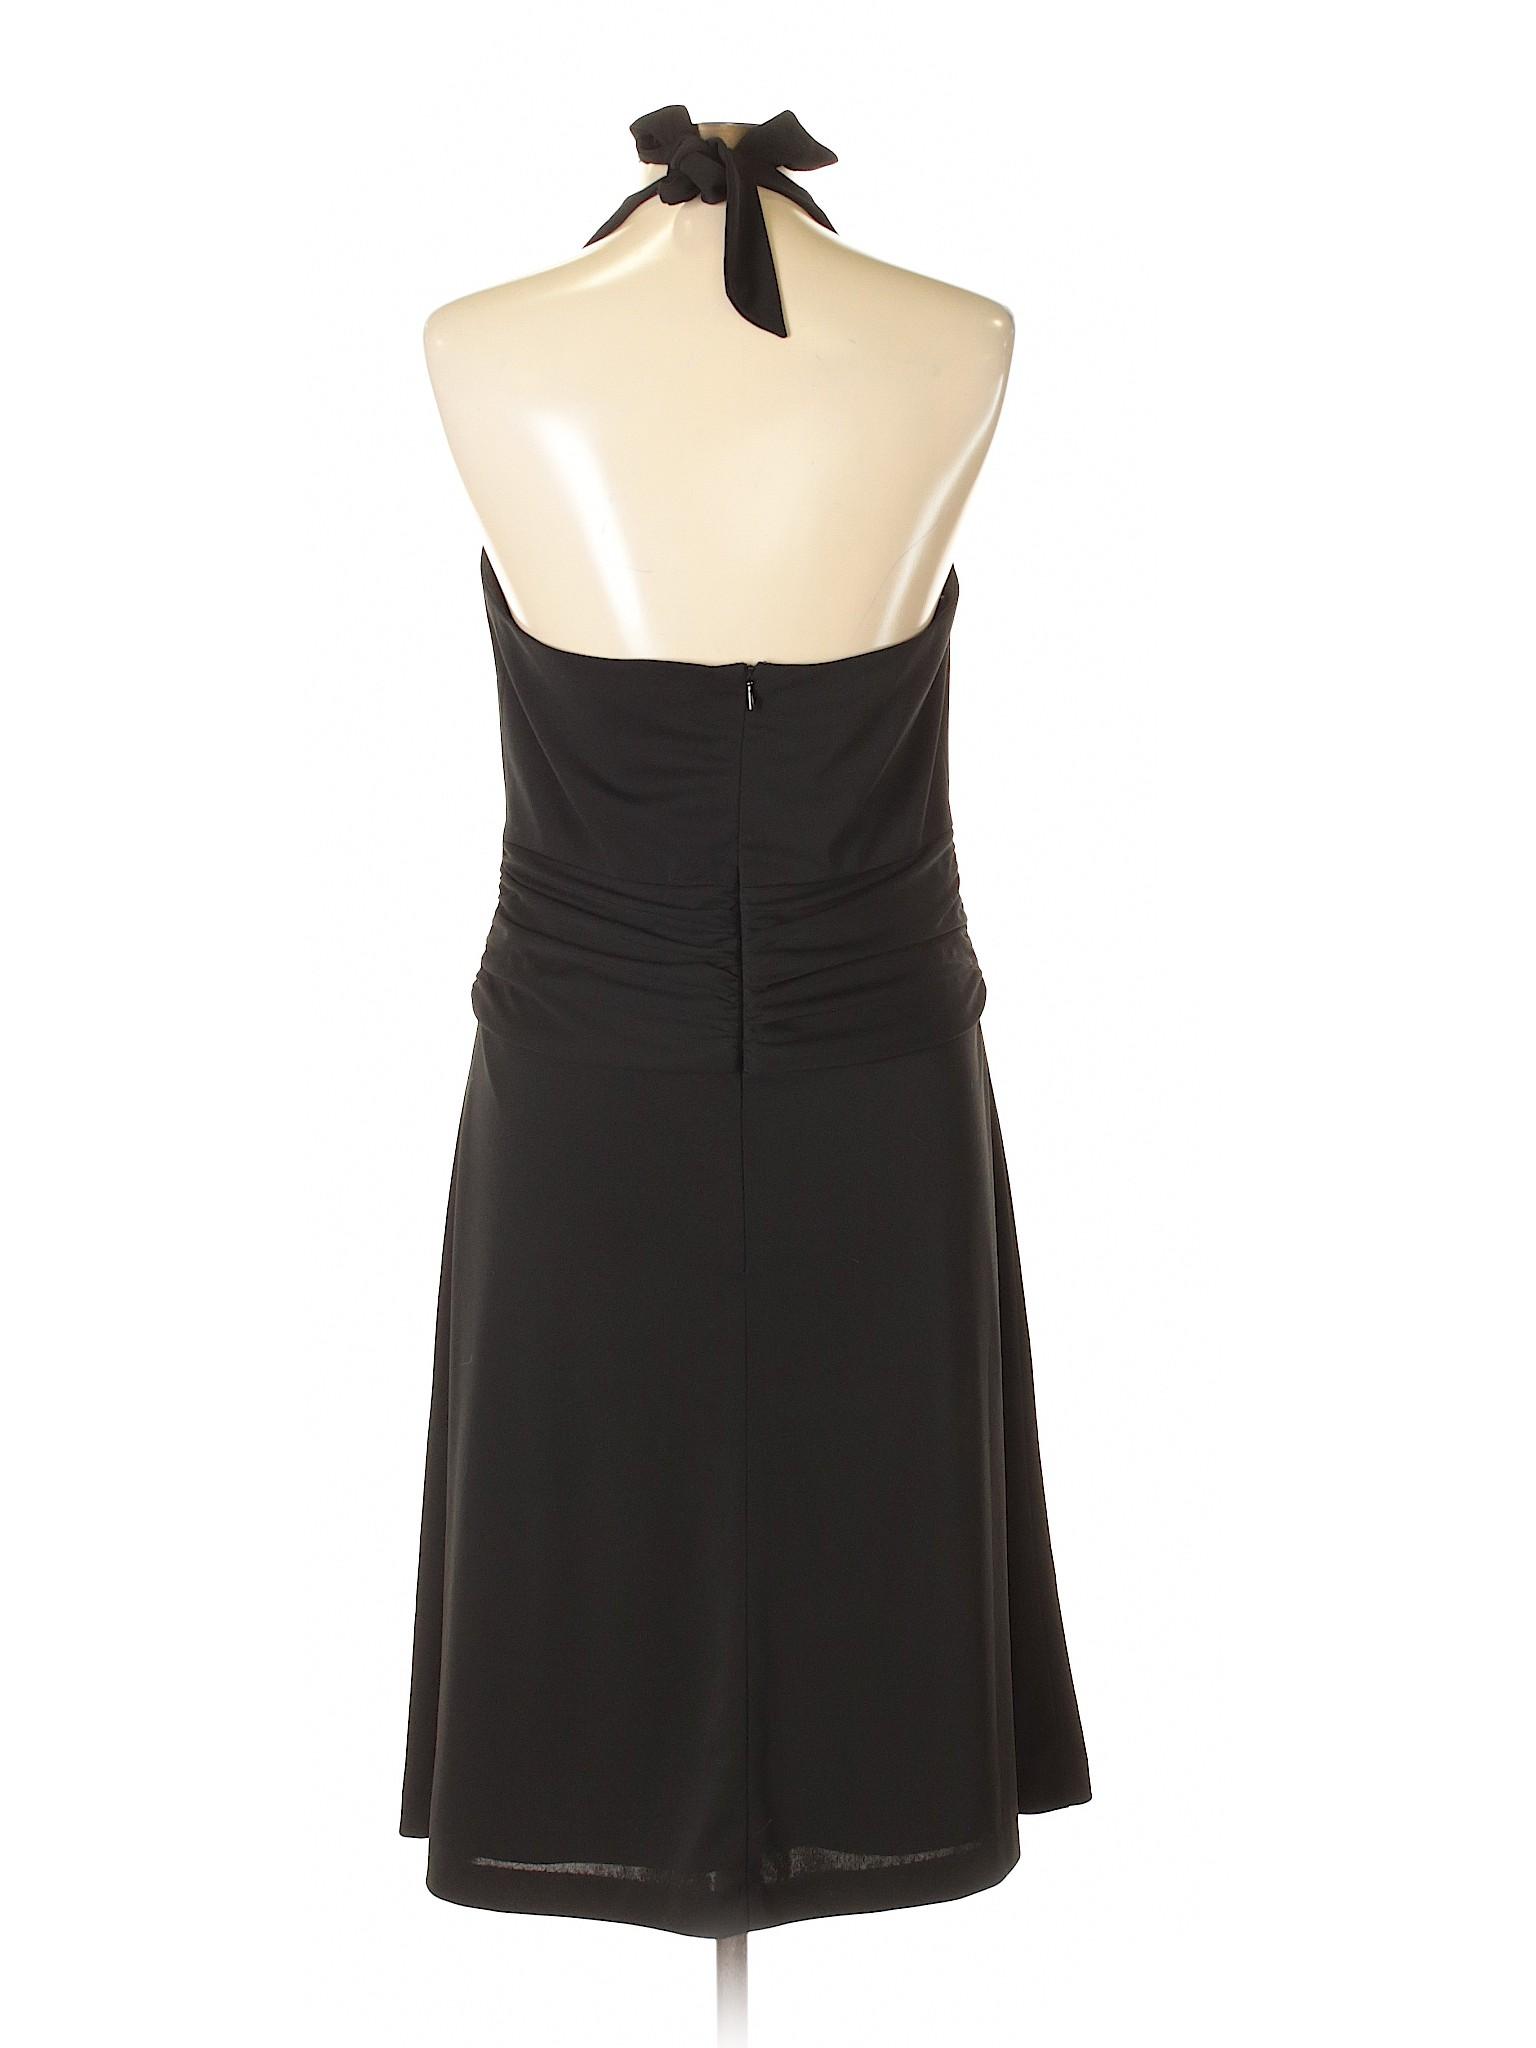 Market Boutique Black House White Dress winter Casual 1qFq6PI8